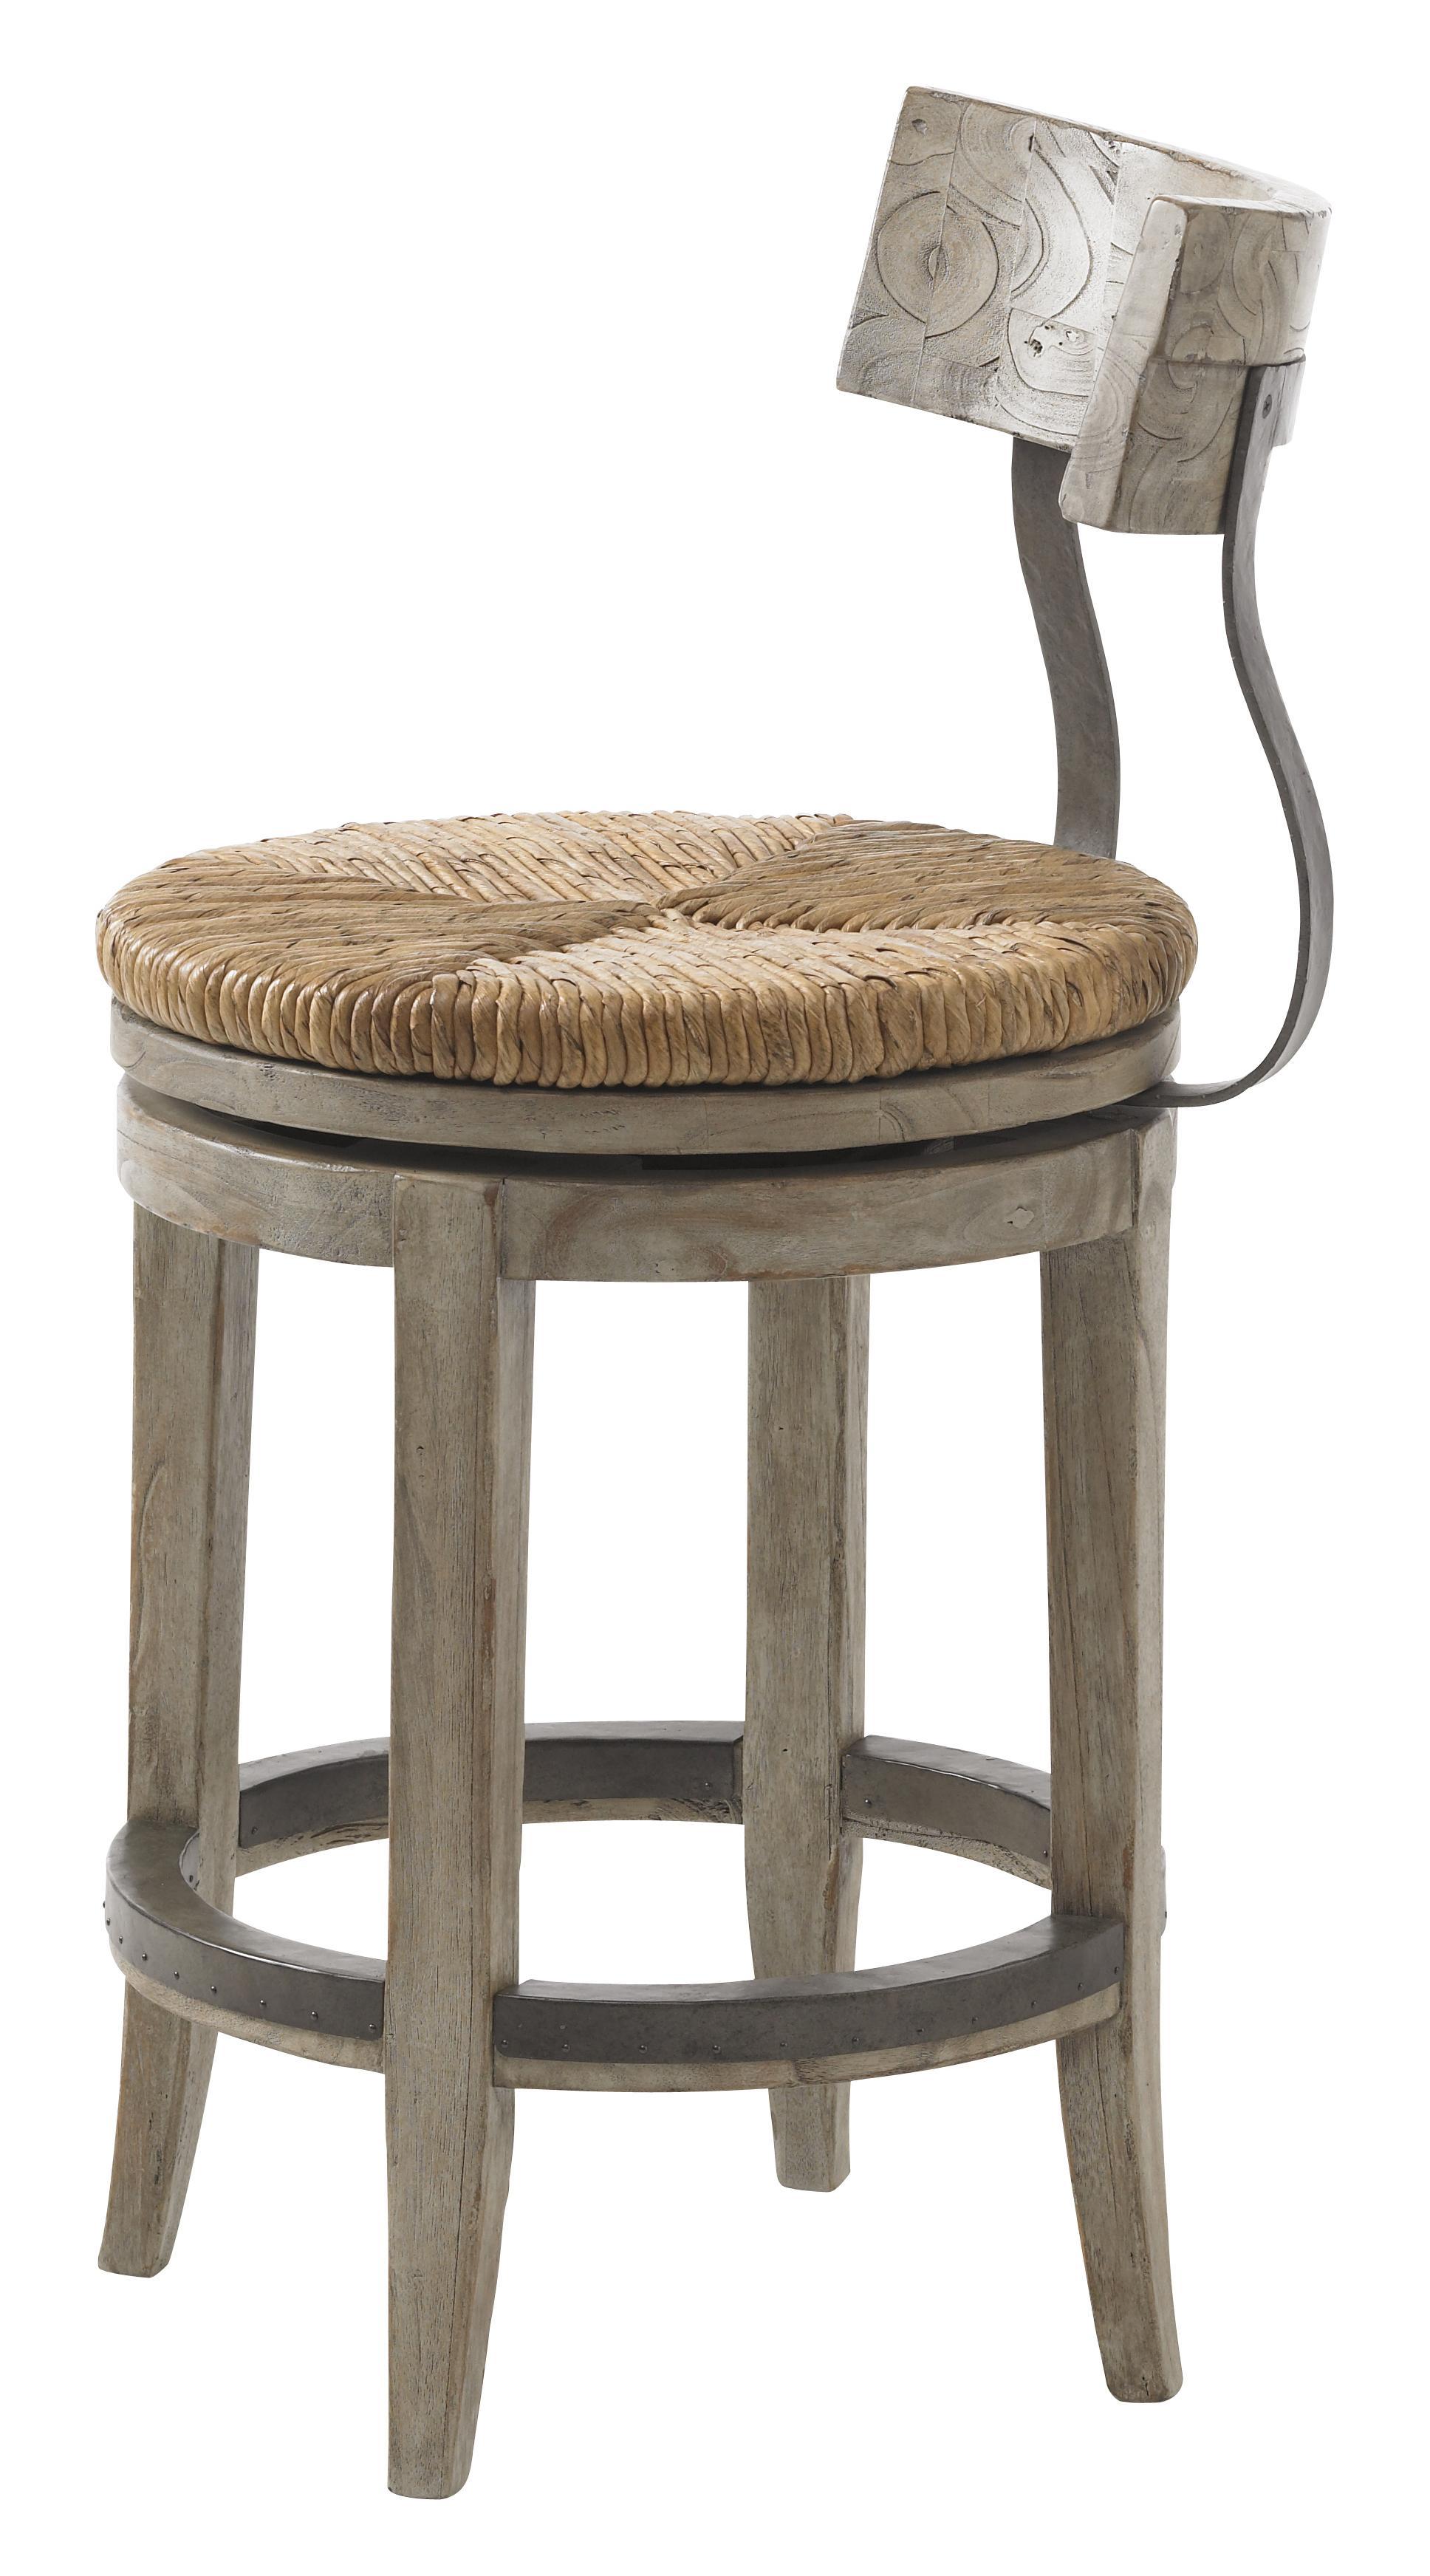 Twilight Bay Dalton Counter Stool by Lexington at Baer's Furniture